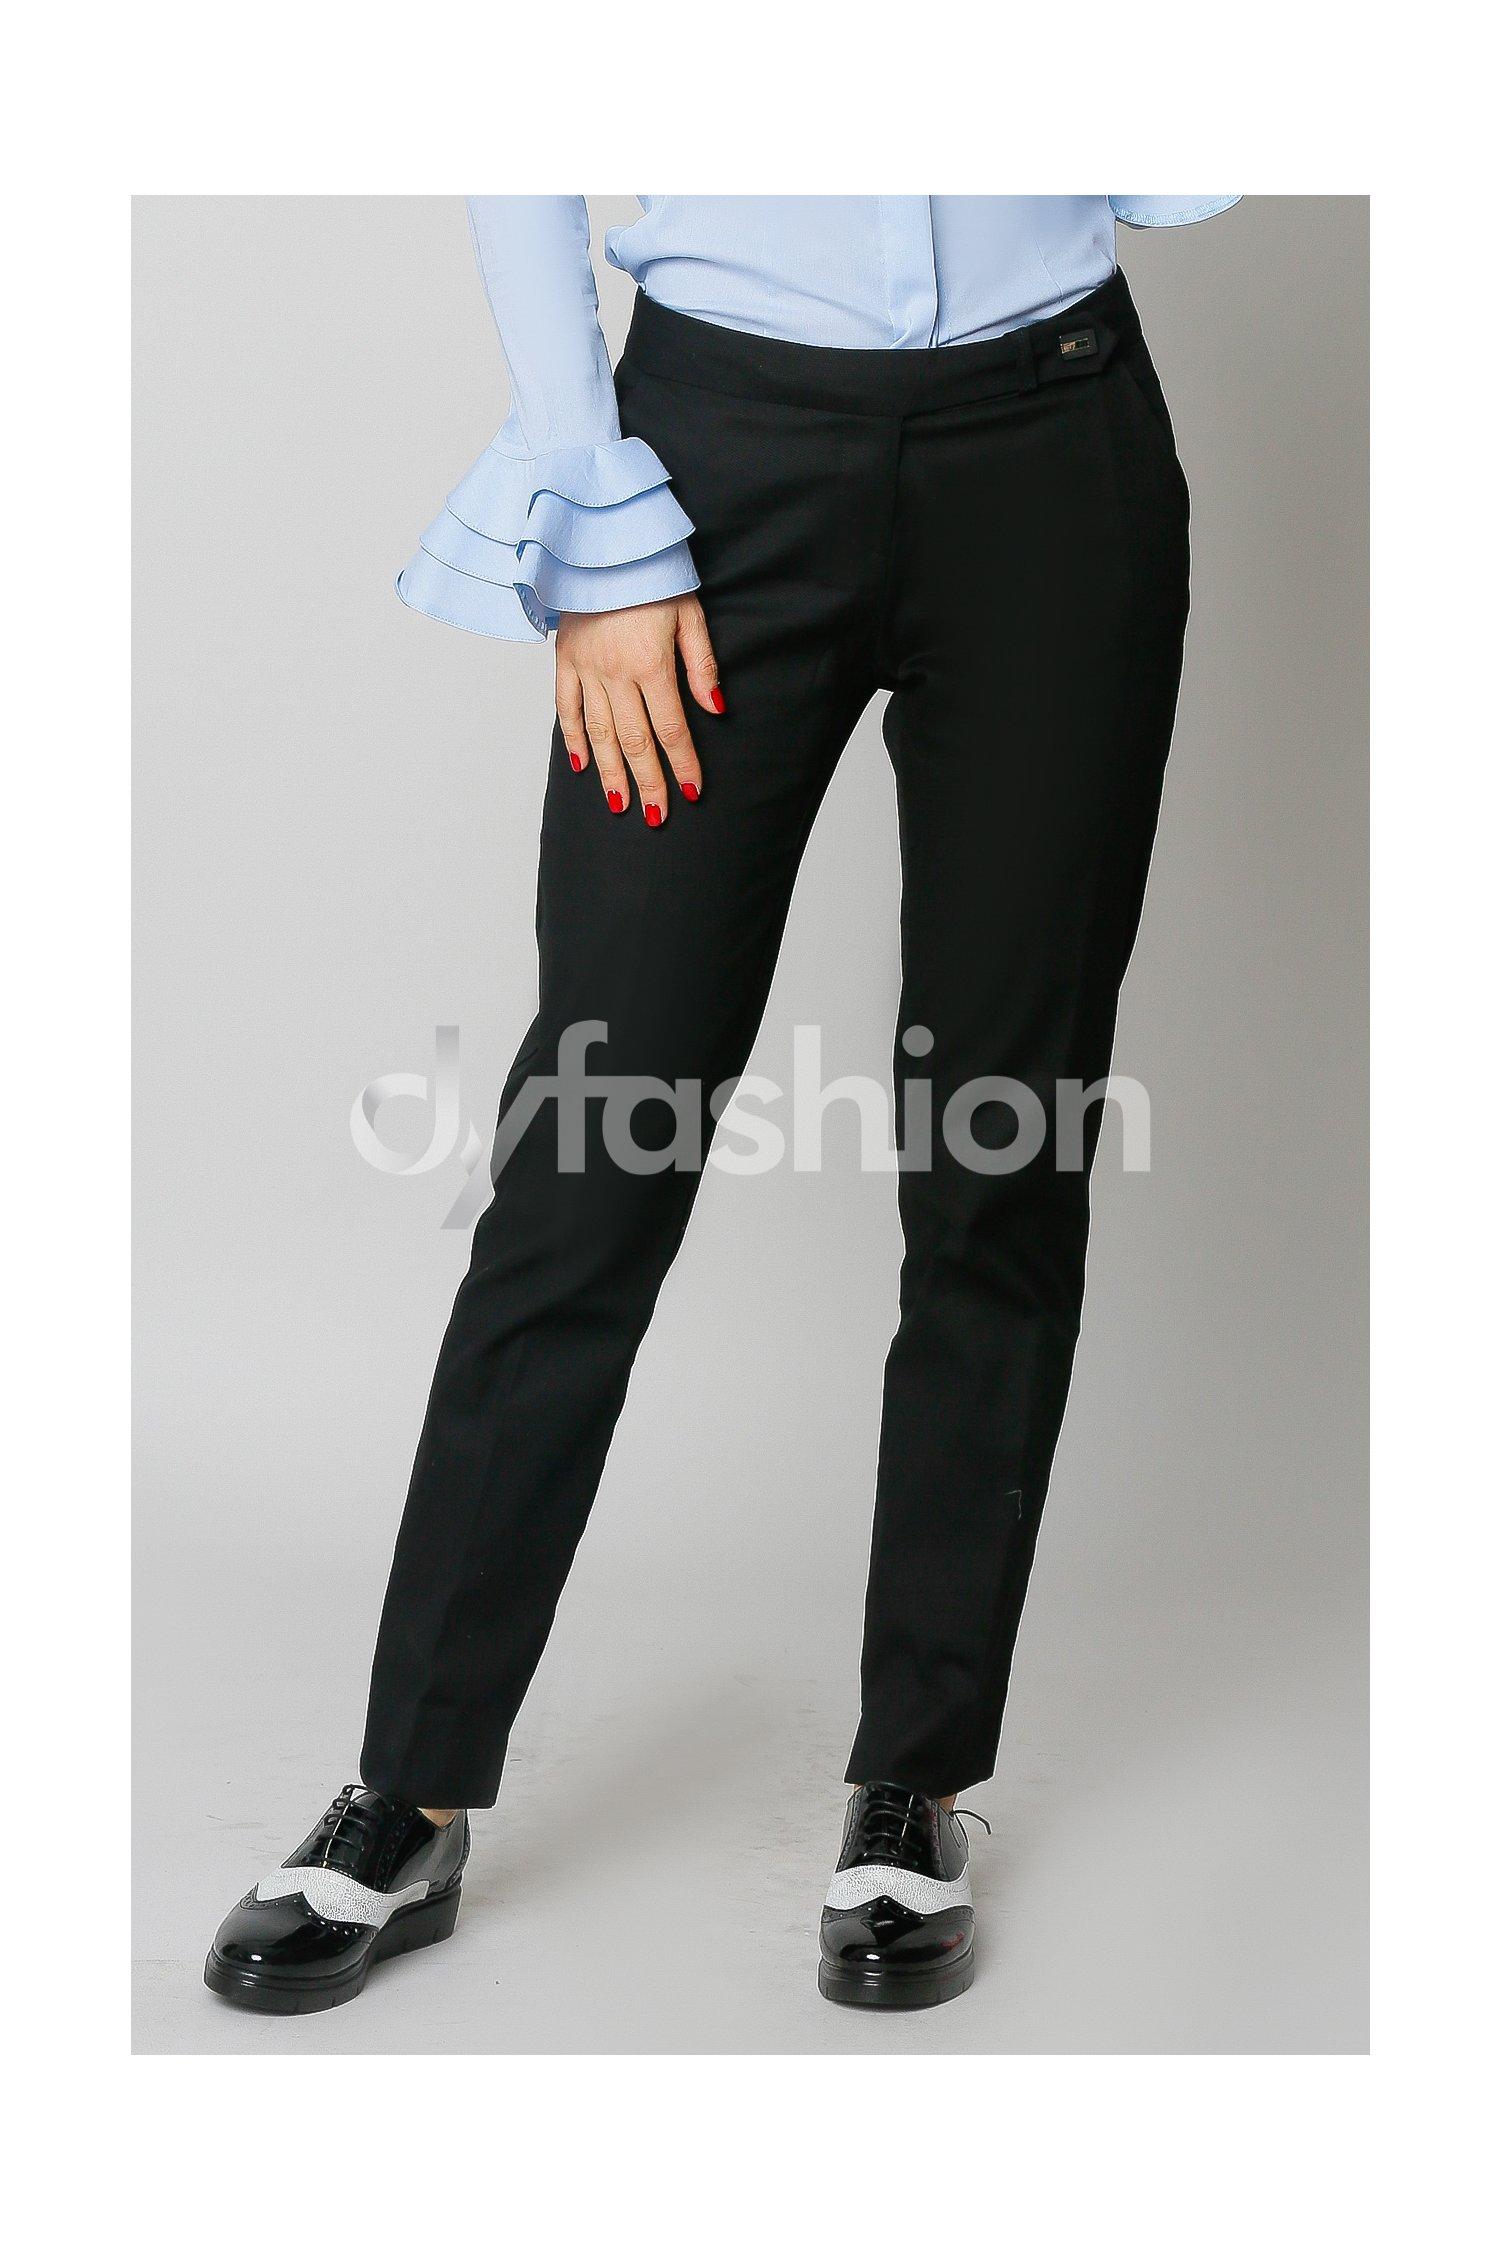 Pantalon Fernanda Negru Office Elegant, colectia 2018